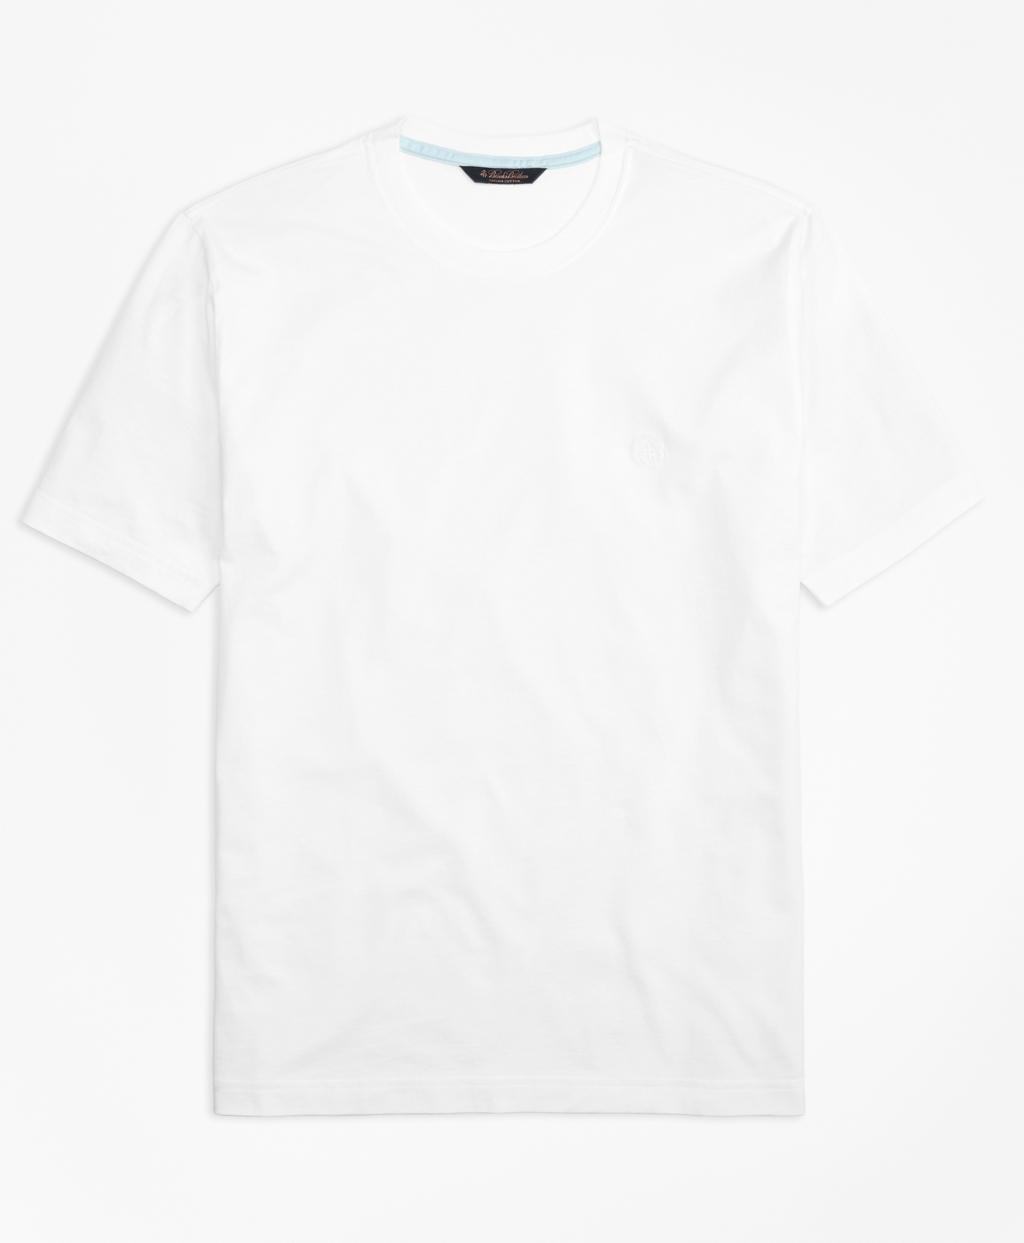 ecbe1fec441 Supima® Cotton T-Shirt - Brooks Brothers